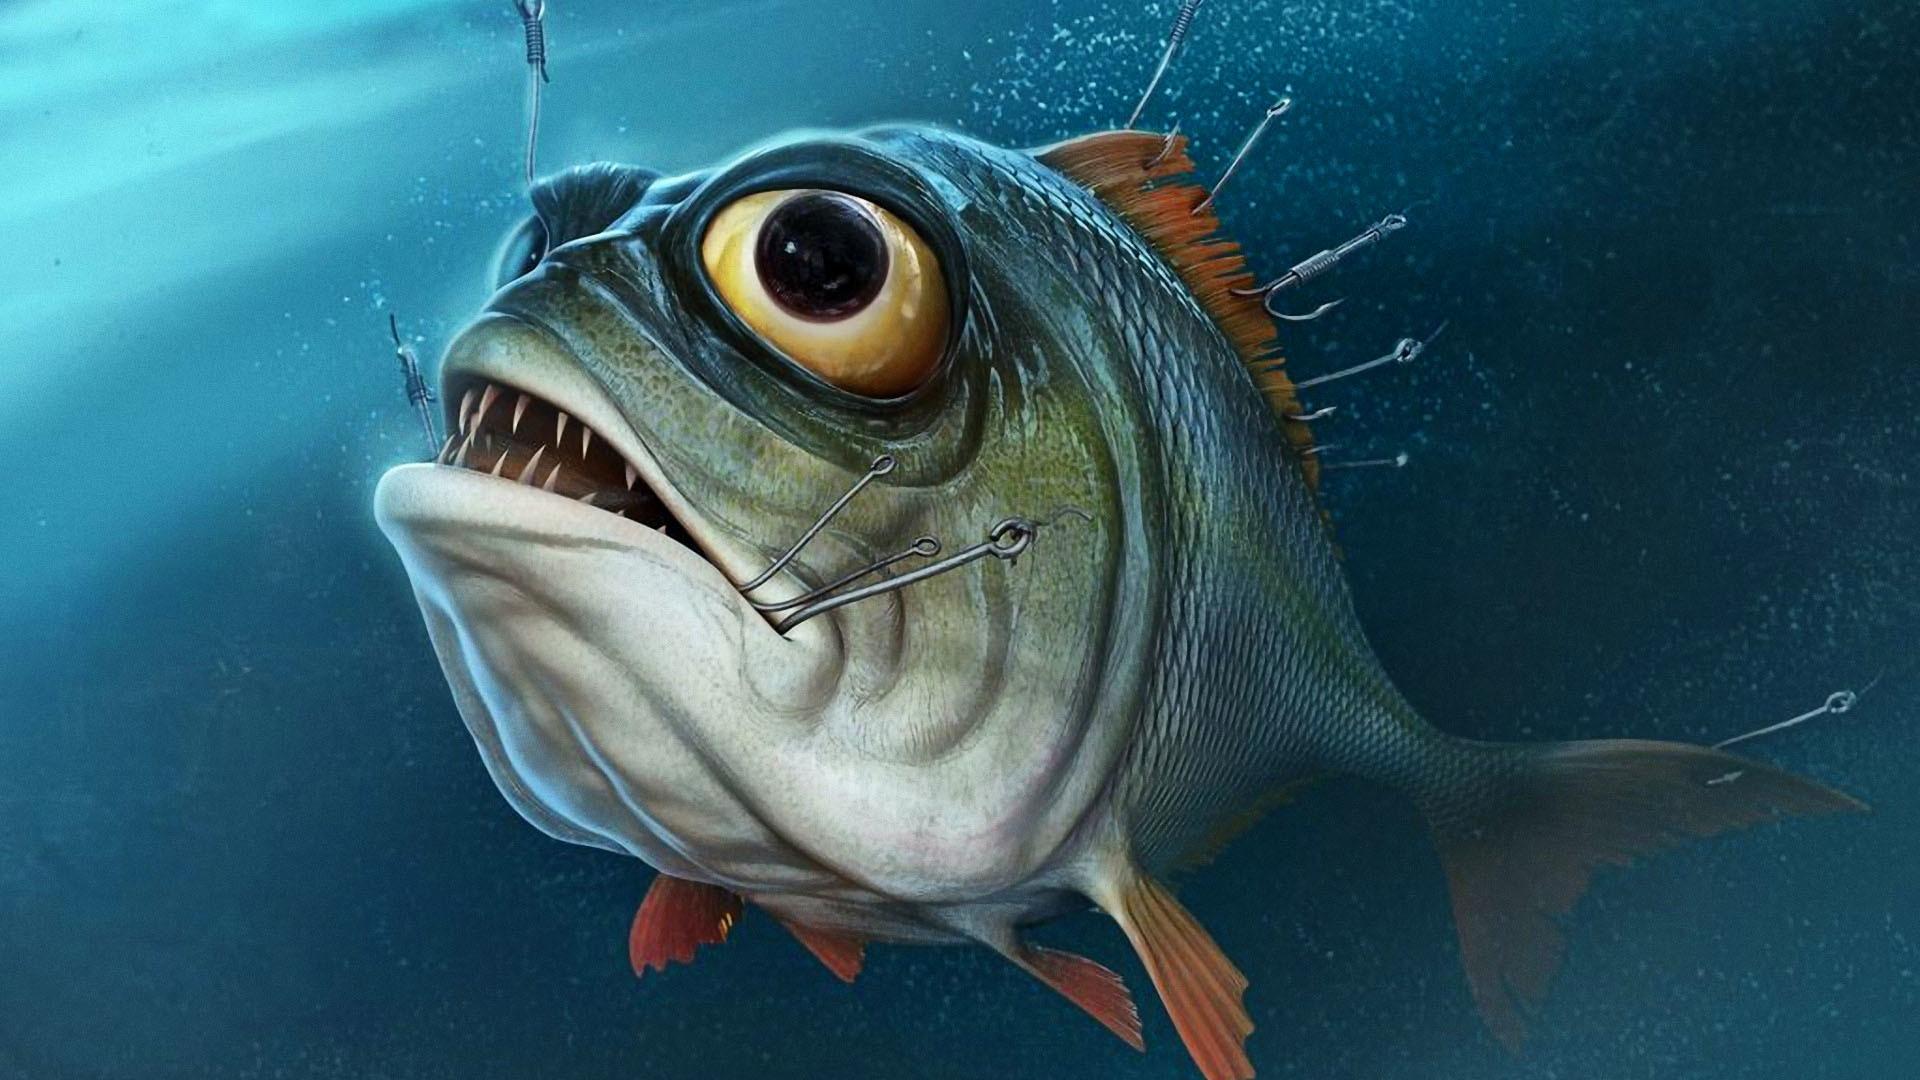 Fishing Wallpaper HD free download.